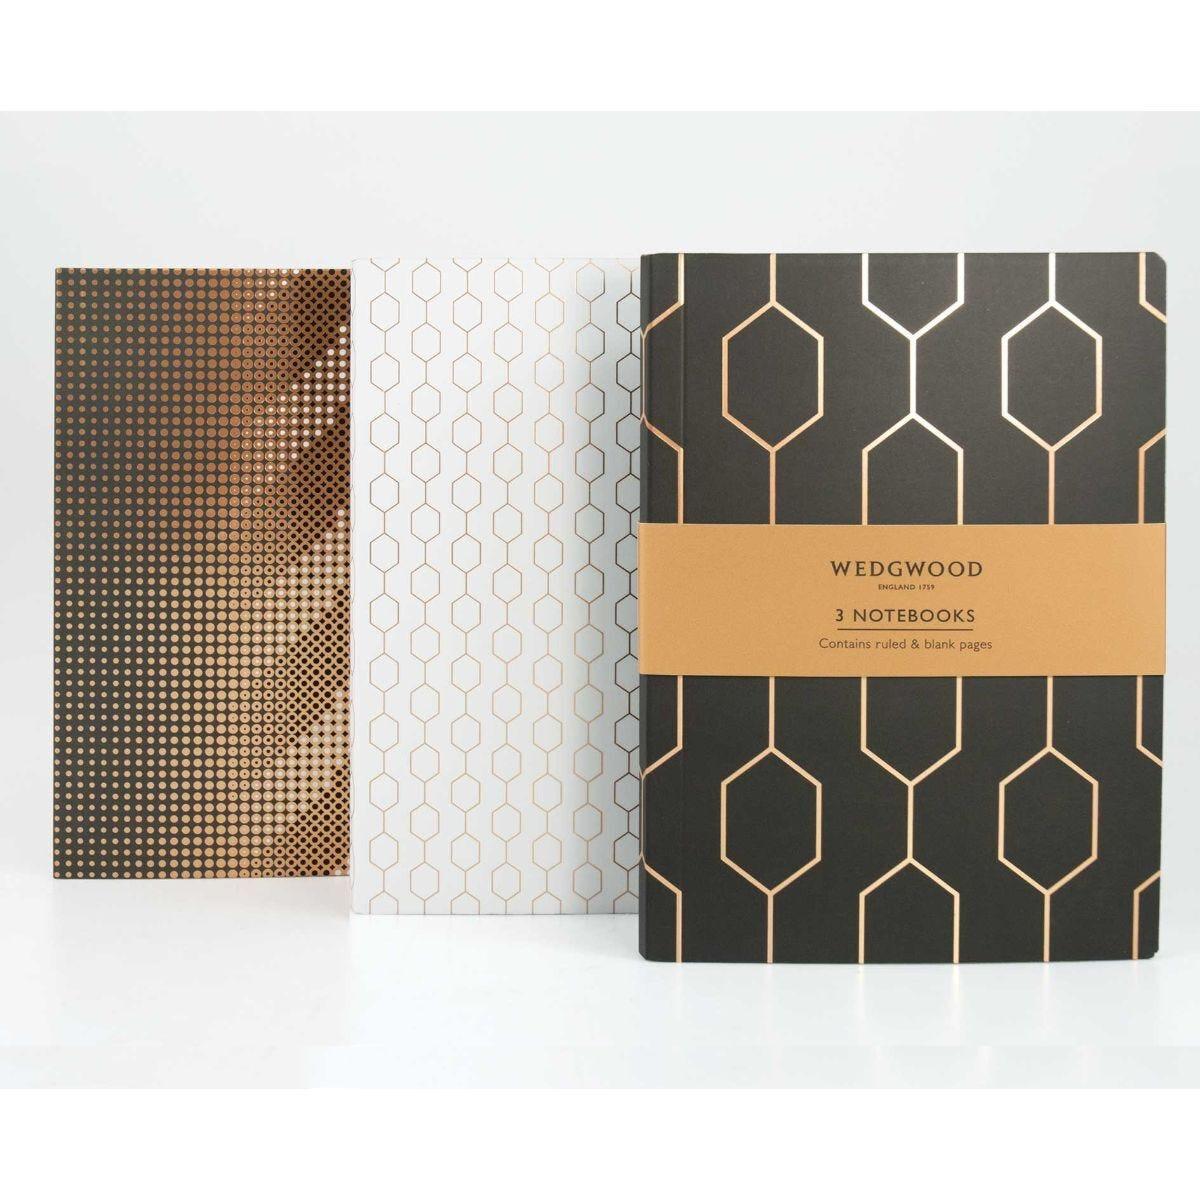 Wedgwood Flexi Notebook Set of 3 B6